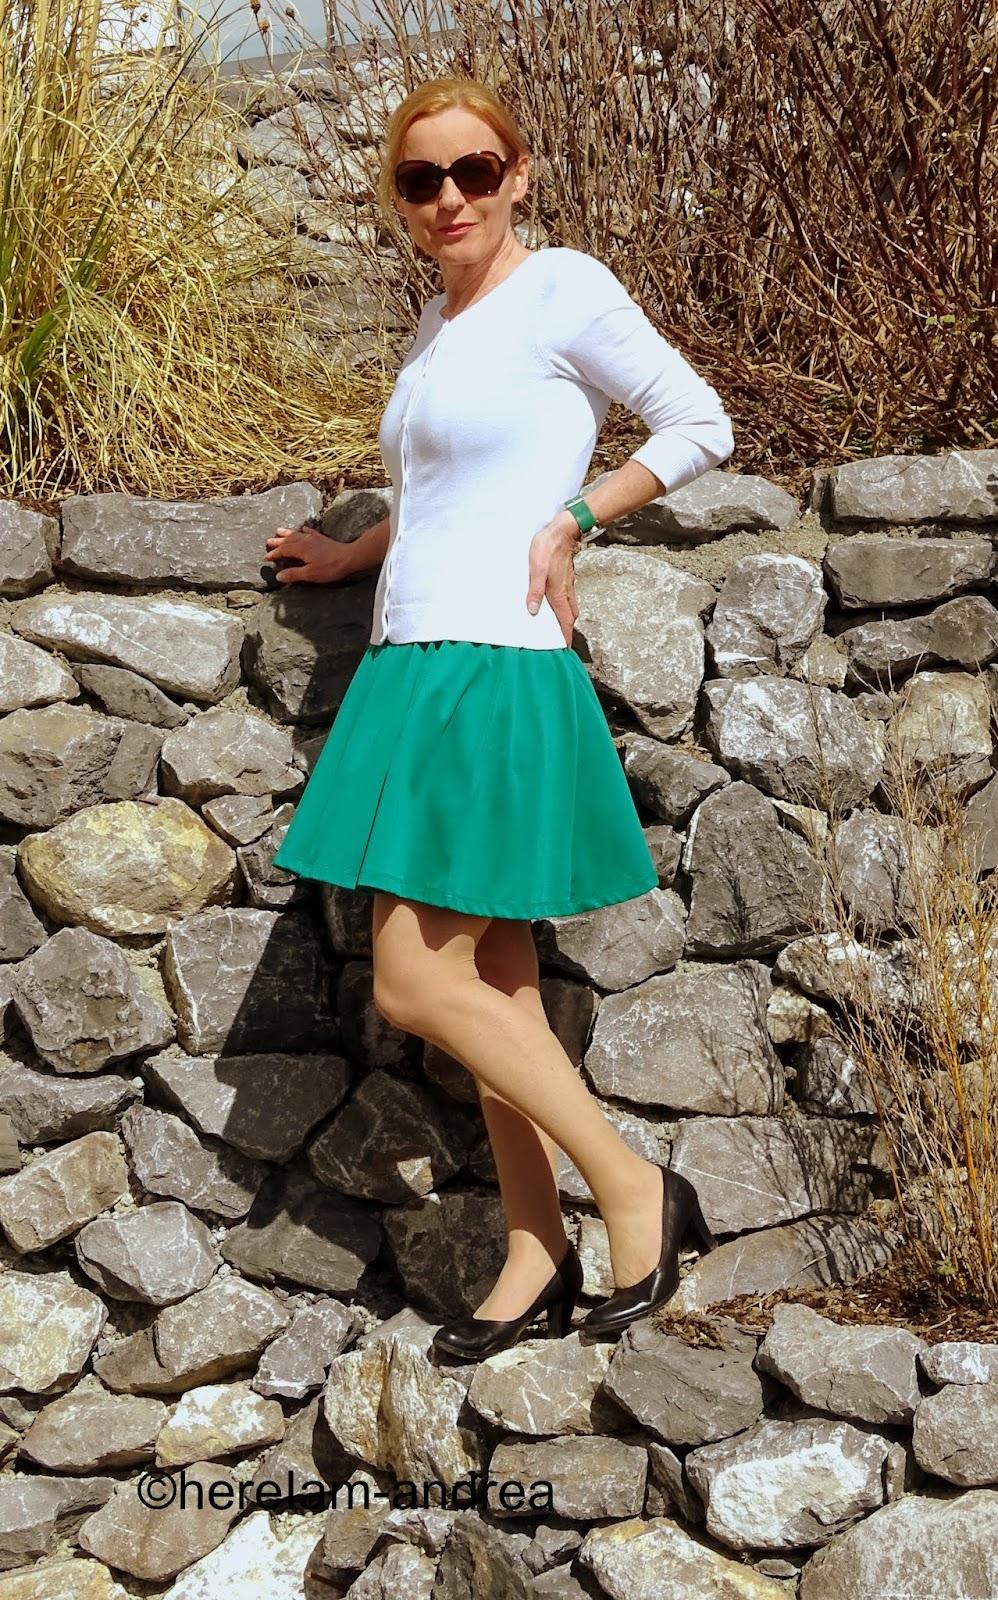 Grün und weiß: entspanntes Frühlingsoutfit